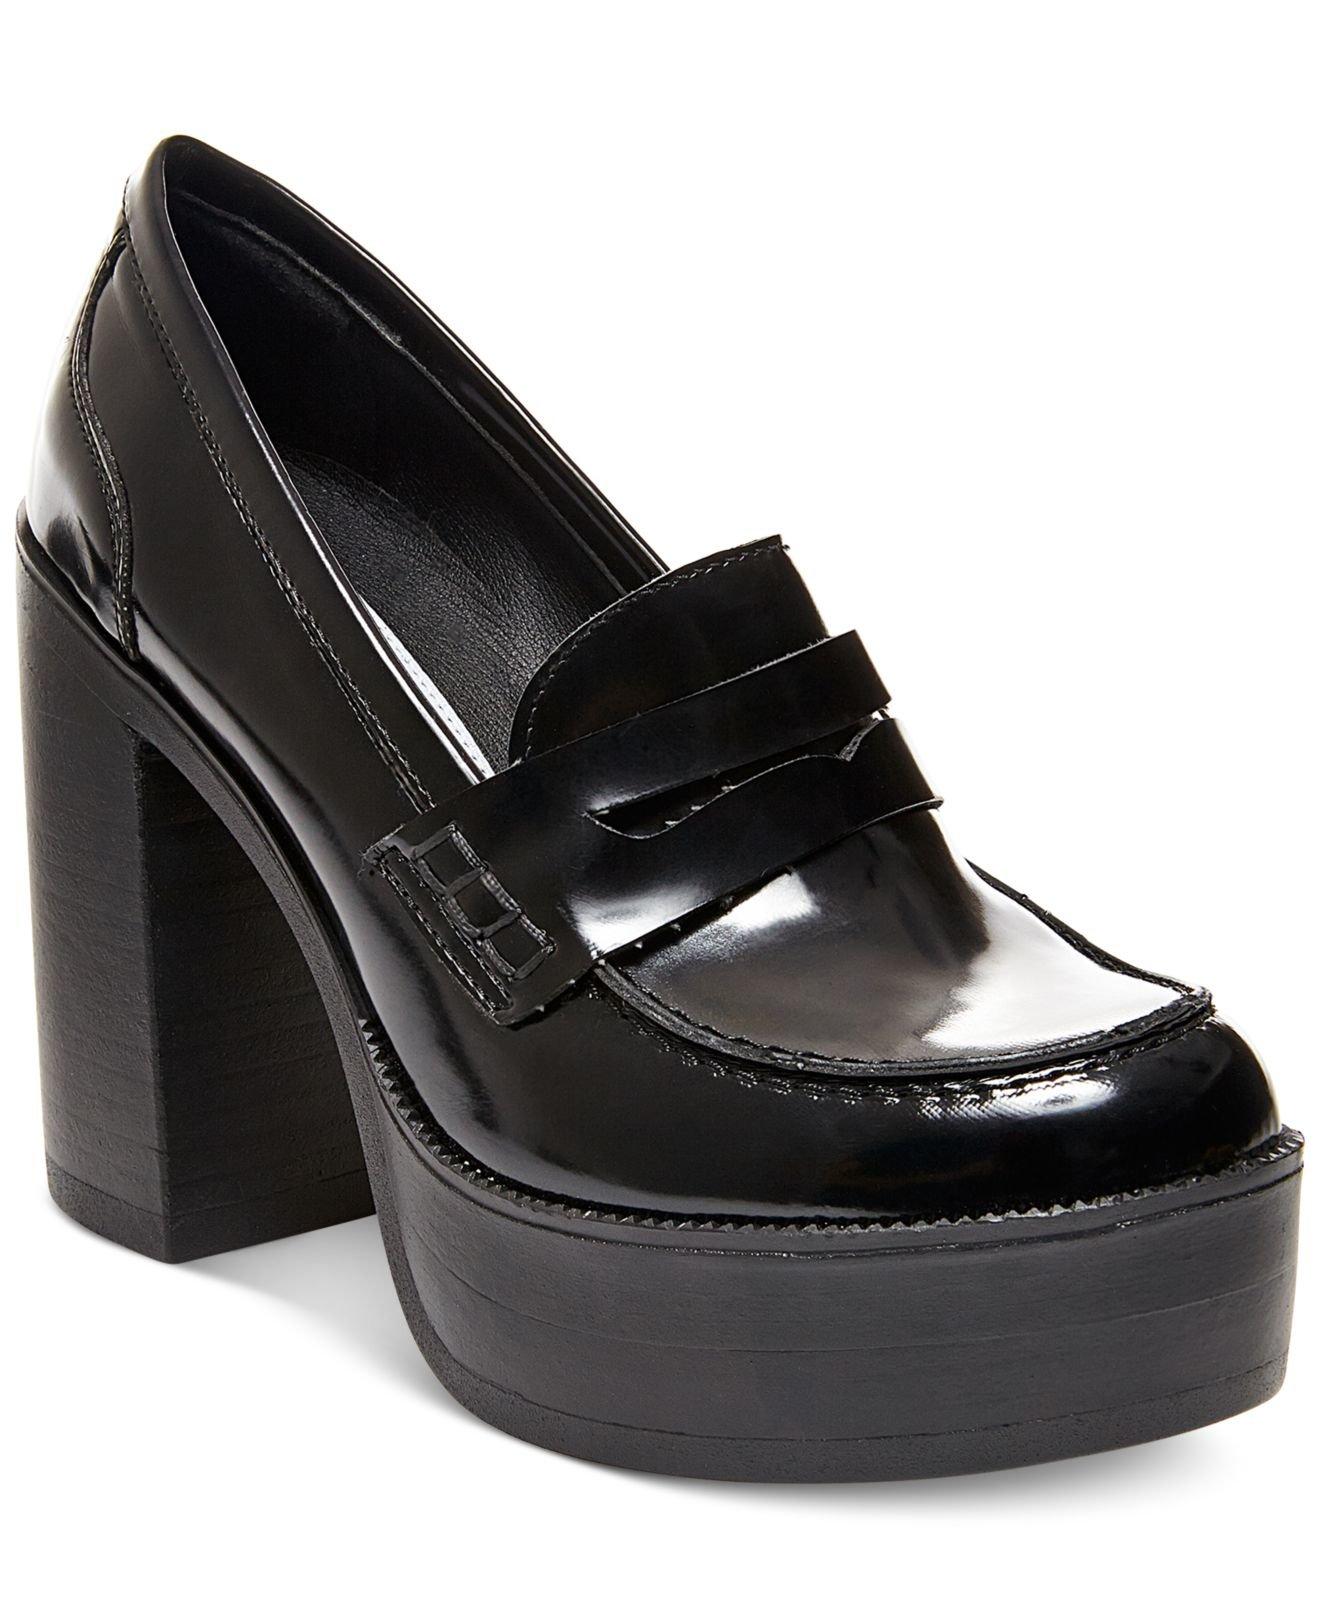 Lyst - Steve Madden Women's Juniper Platform Penny Loafers ...